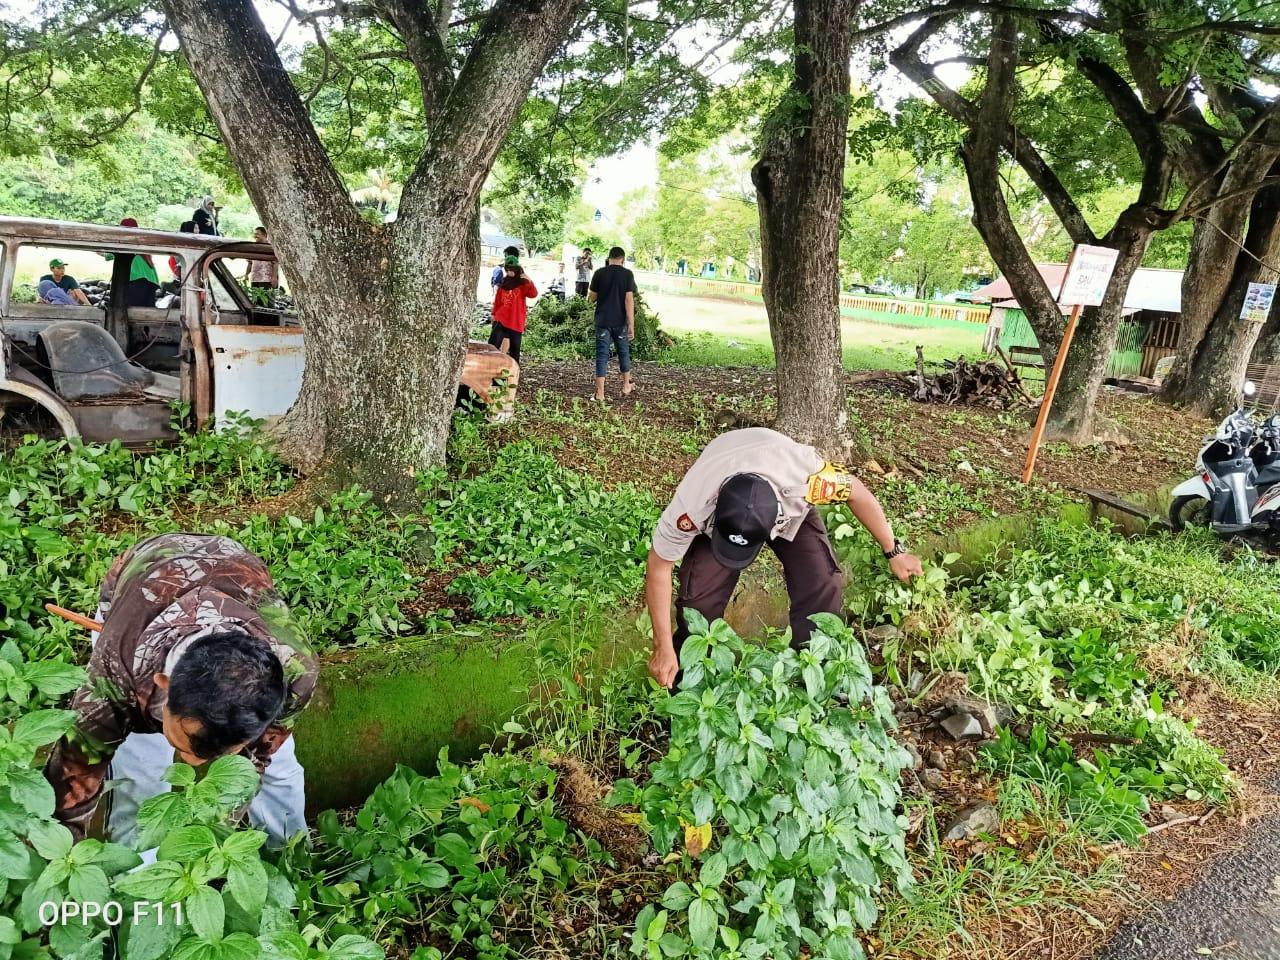 Kapolres Soppeng Laksanakan Kerja Bakti di Sekitar Polres dan Polsek Jajaran